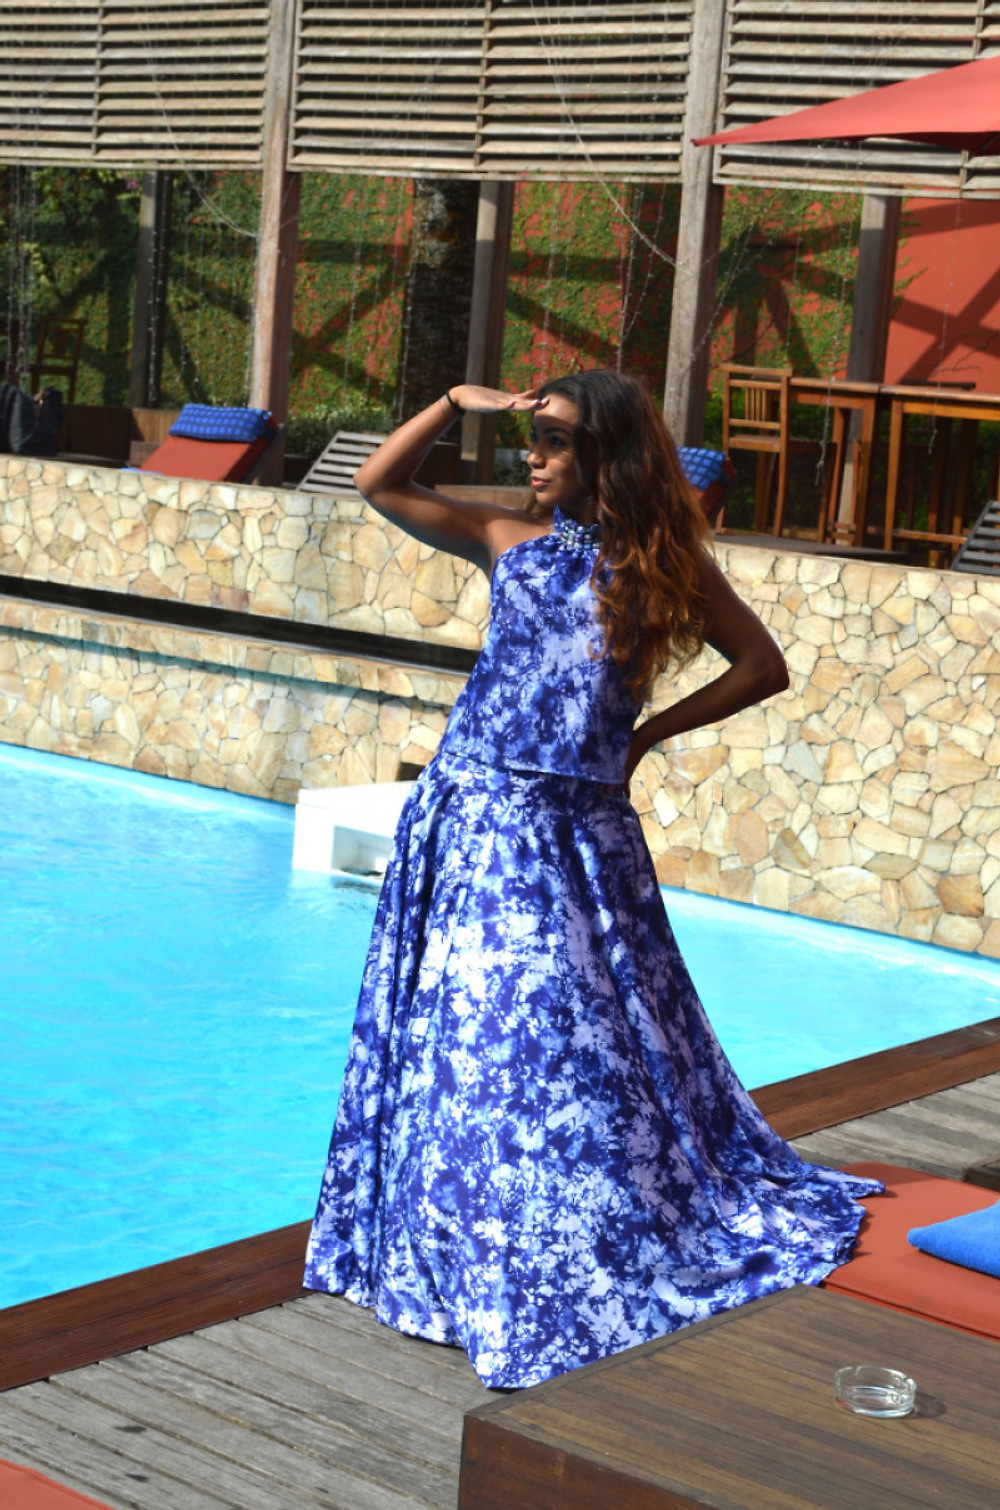 Habillée par KREYANN à l'hôtel AKWA PALACE.